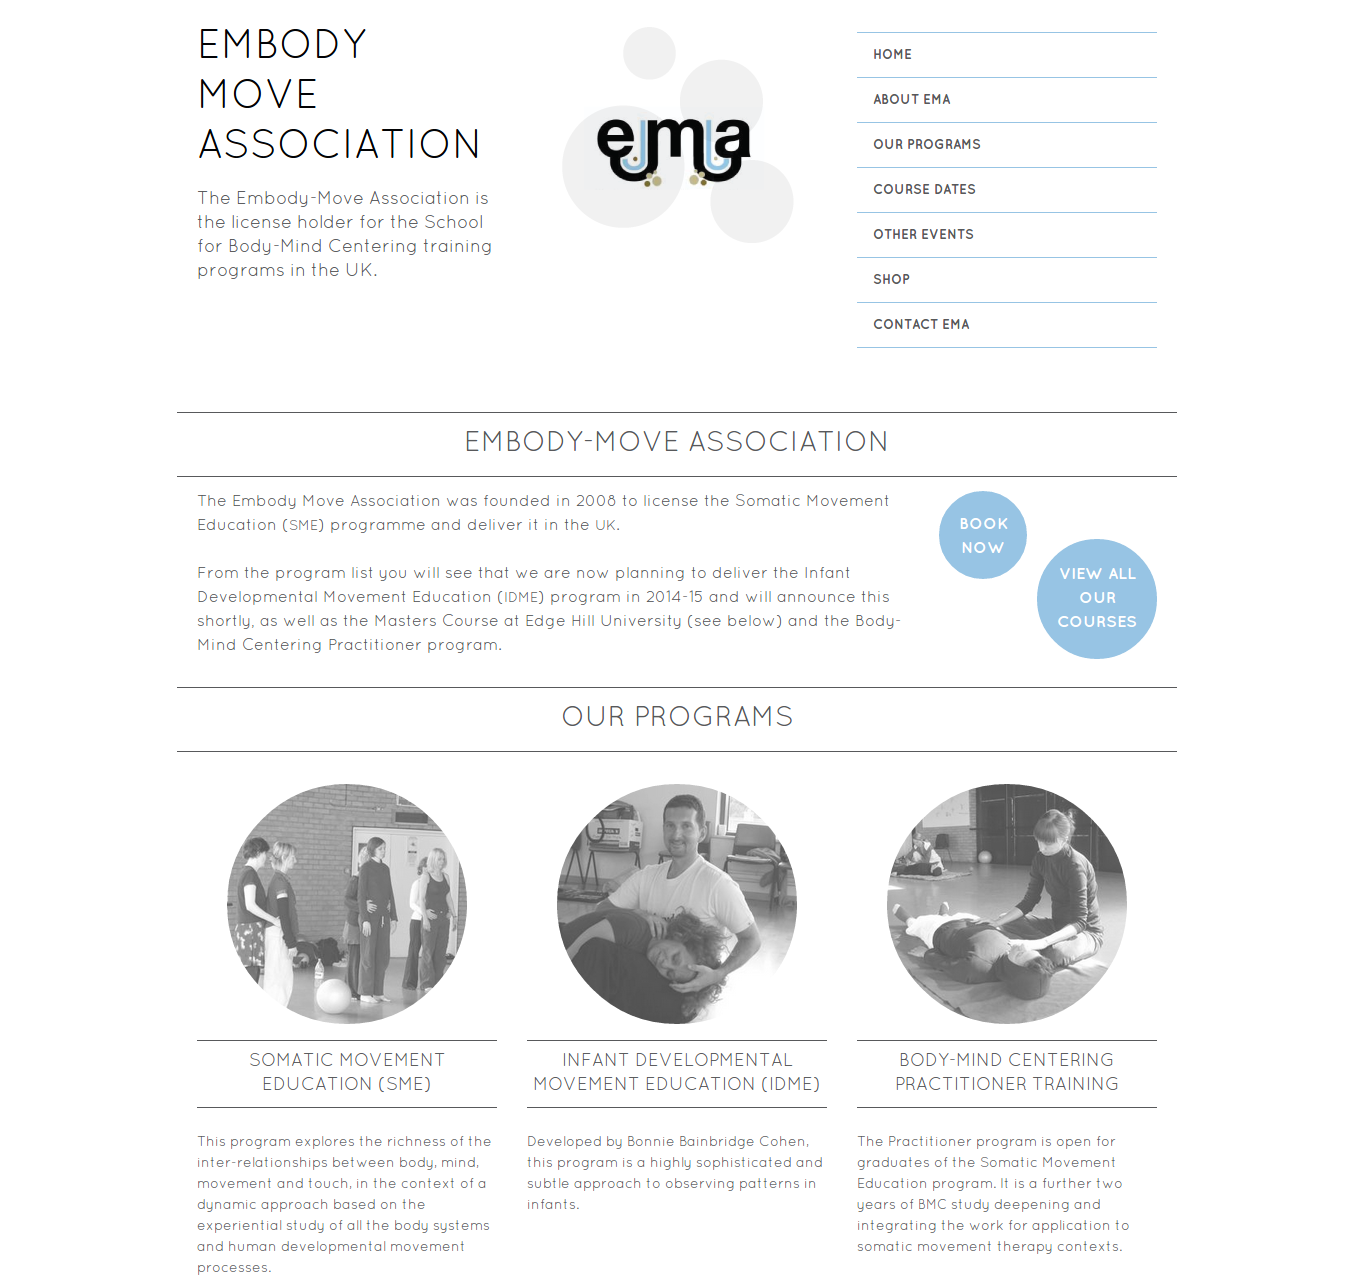 Embody Move Association